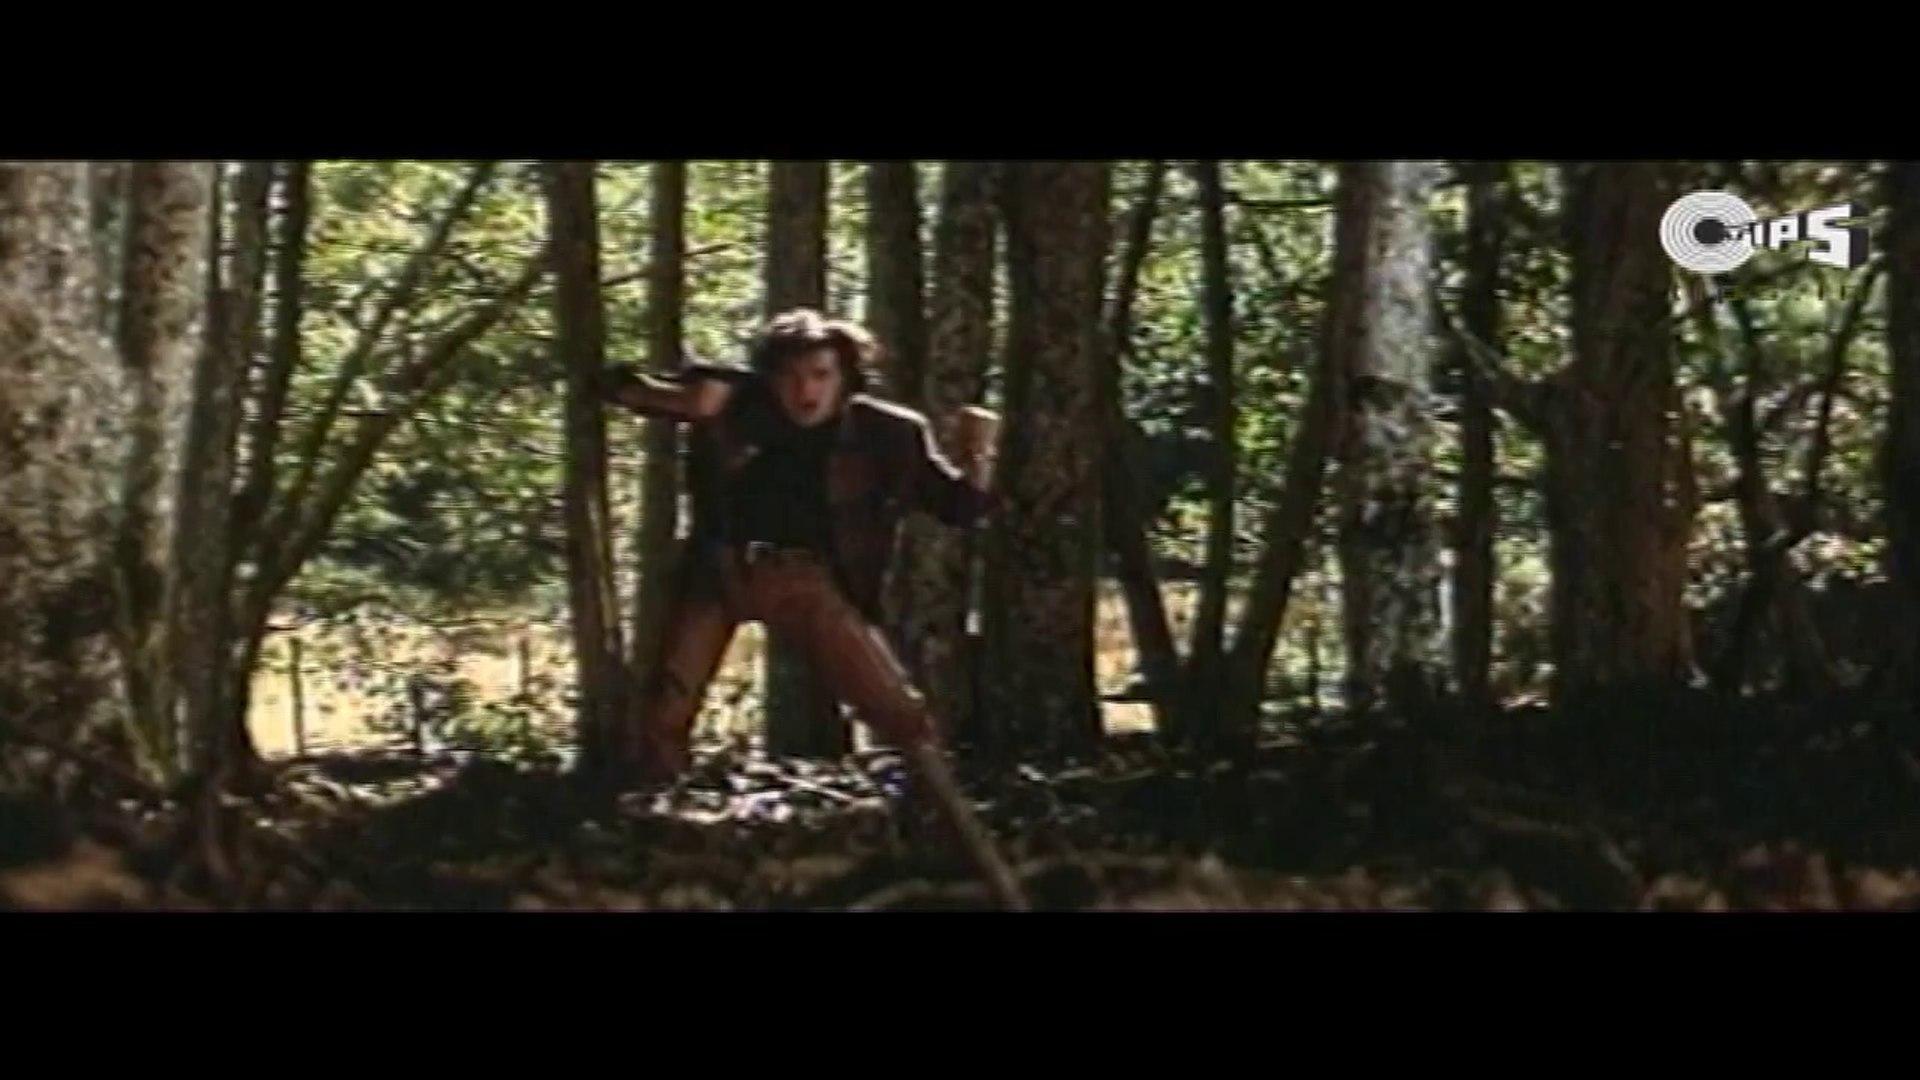 Mushkil Bada Yeh Pyar Hai - Gupt - Bobby Deol & Manisha Koirala - Full Song - YouTube